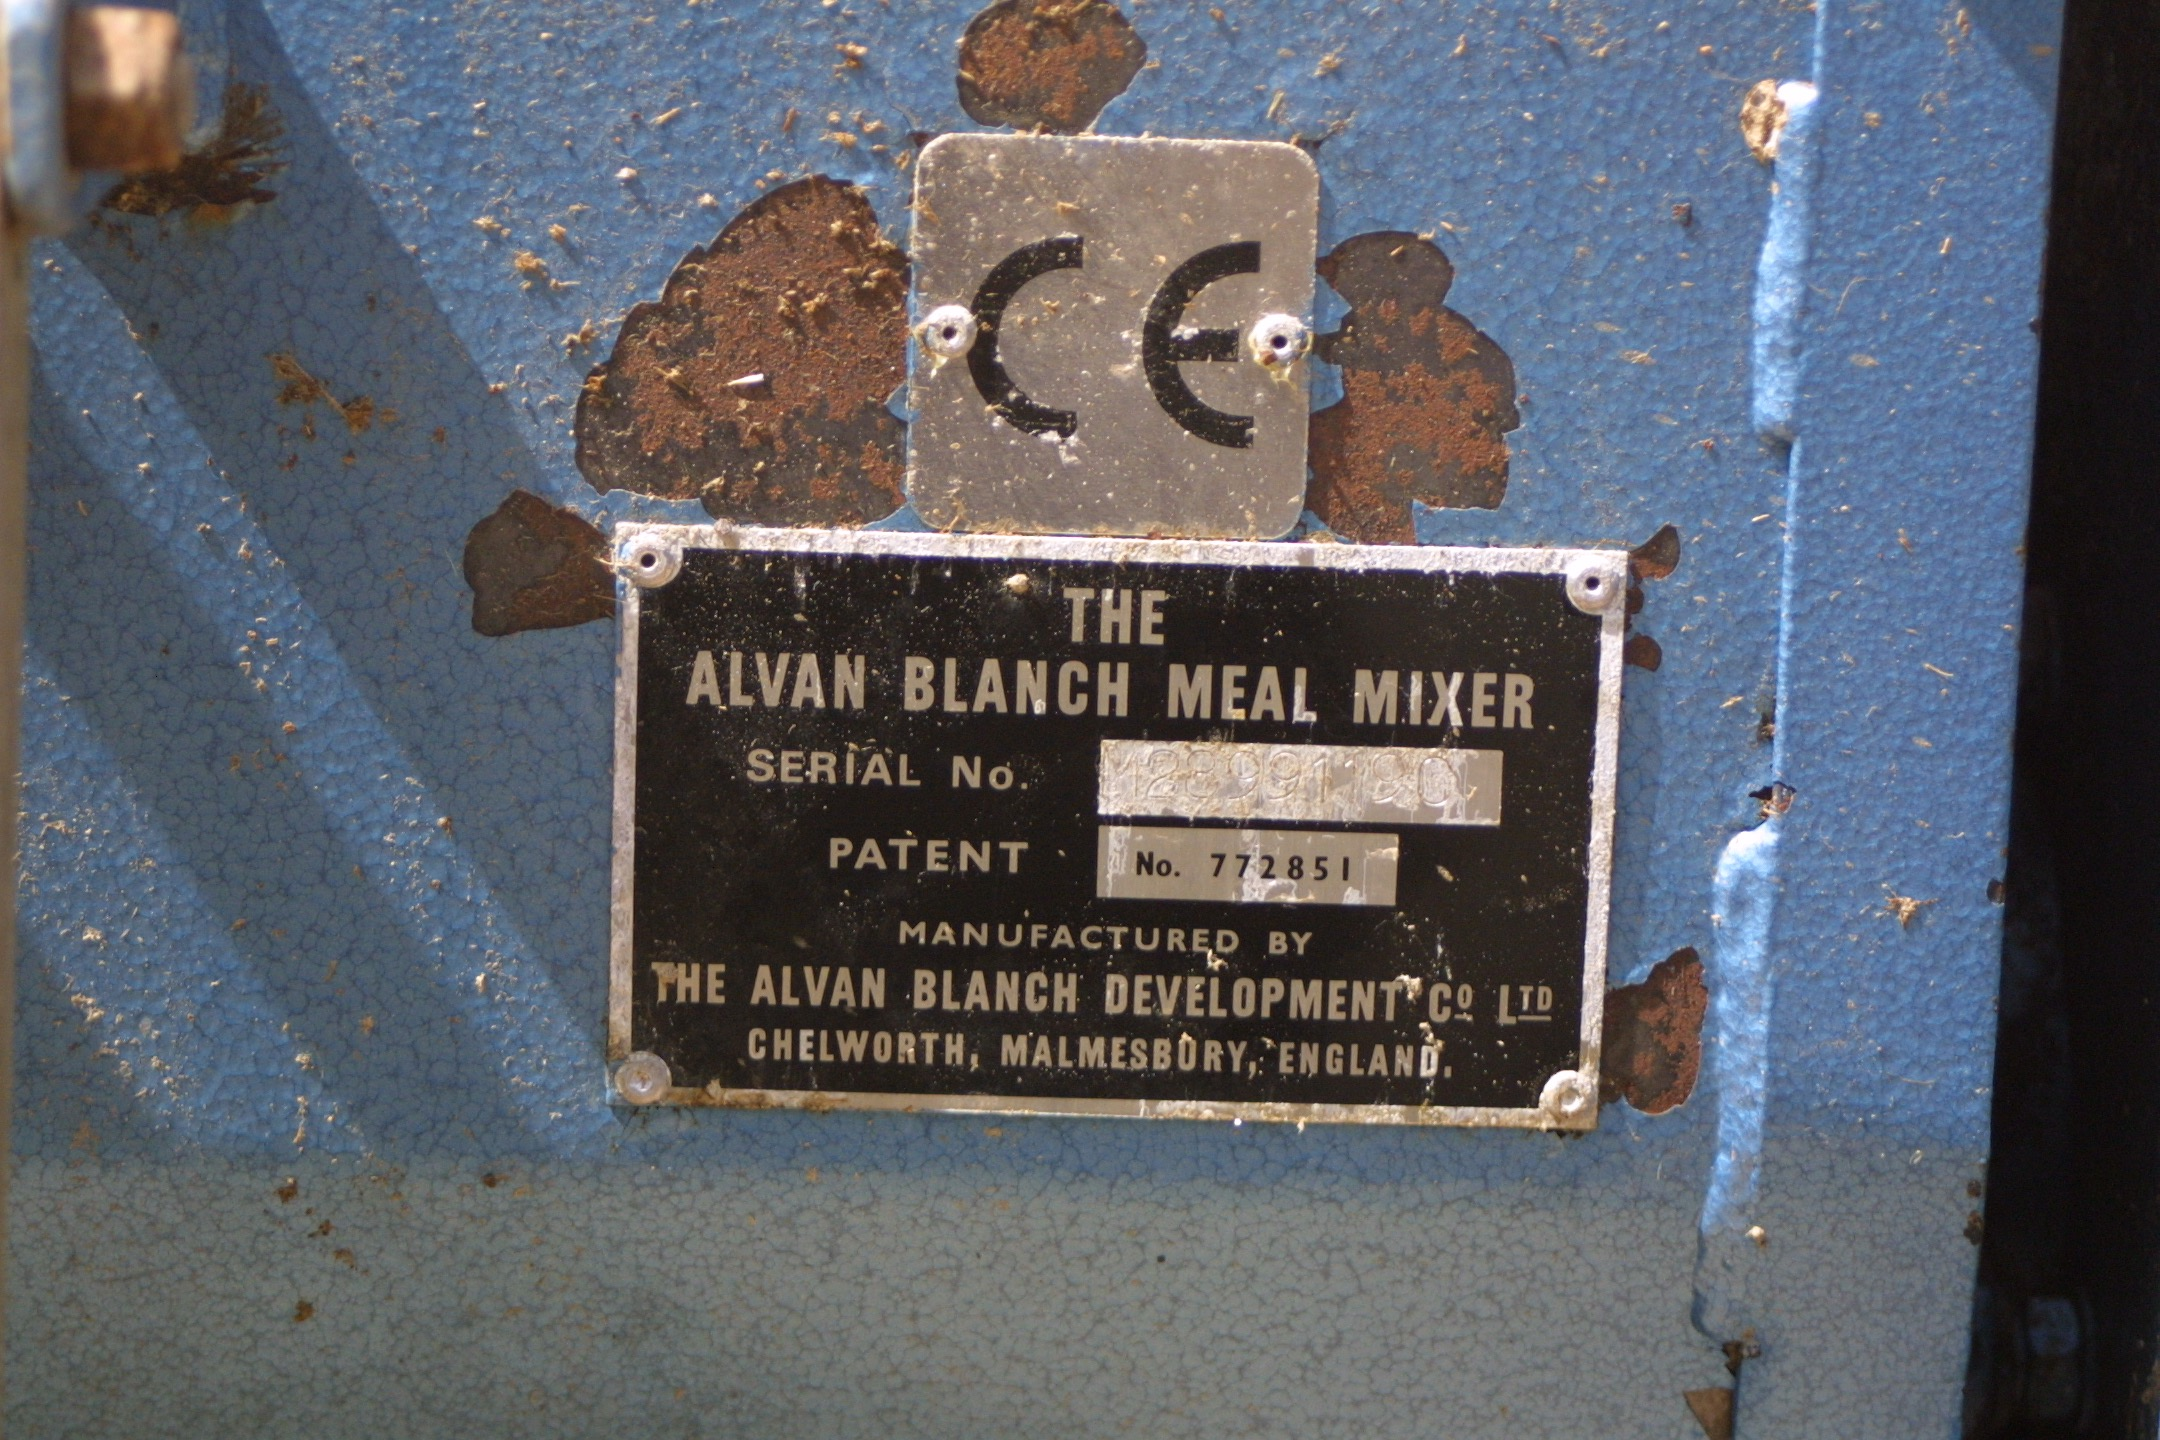 For Sale - Alvan Blanch Half-Tonne Meal Mixer